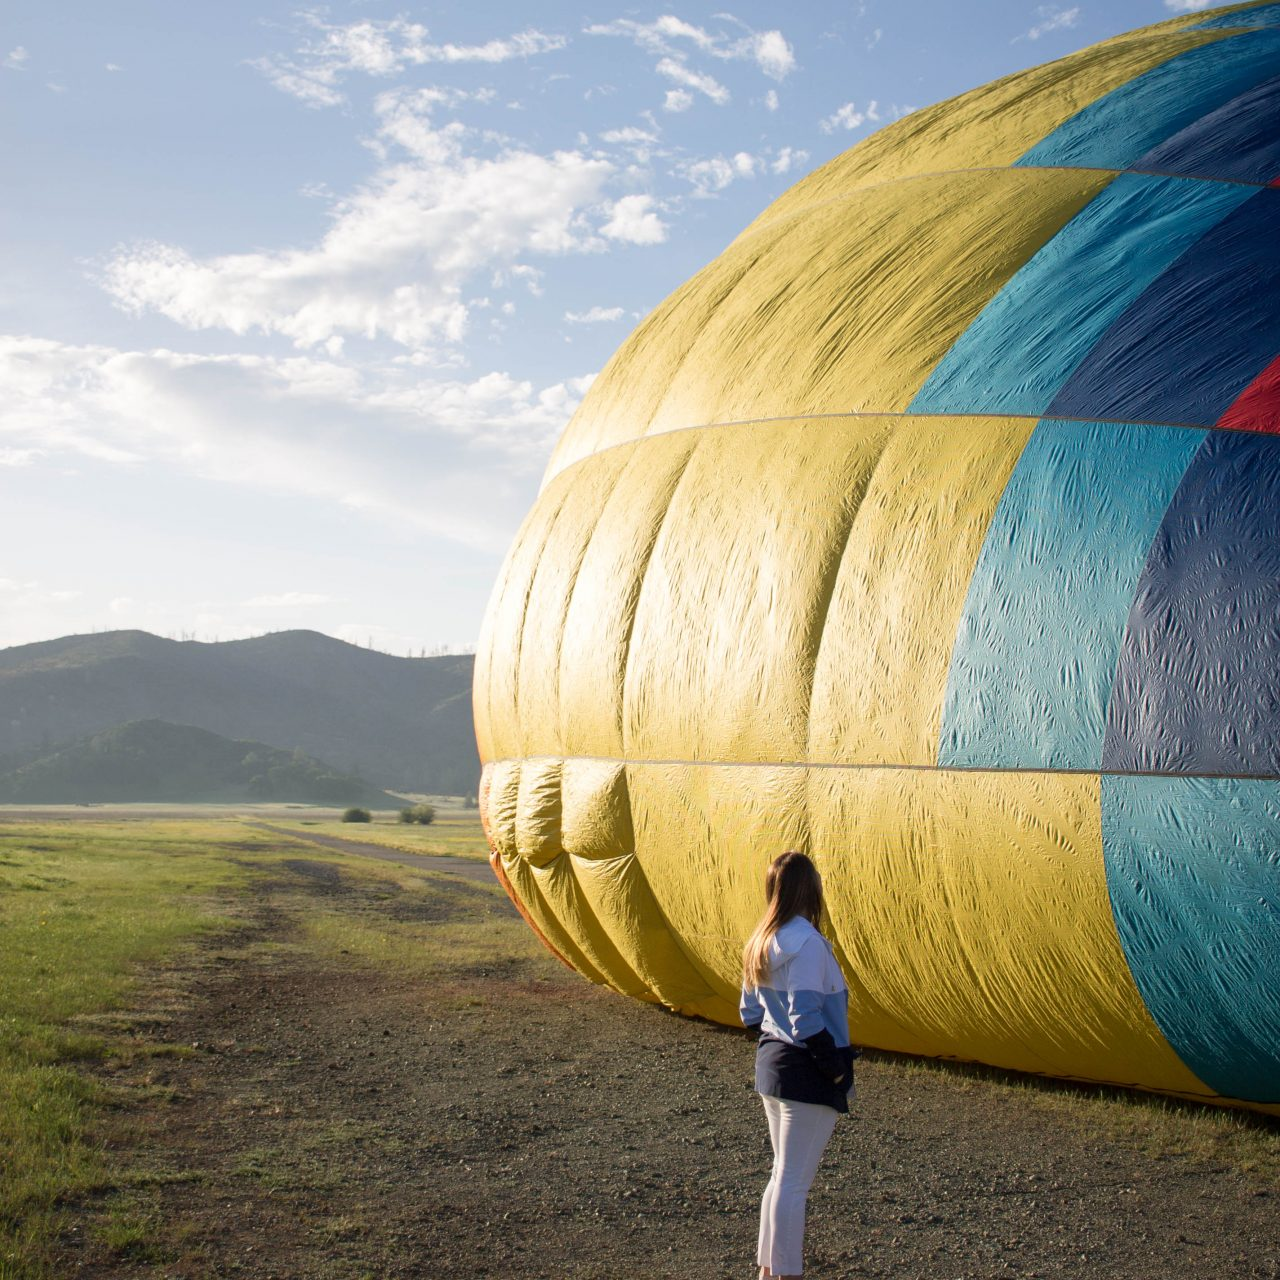 A Napa Valley Hot Air Balloon Ride With Calistoga Balloons